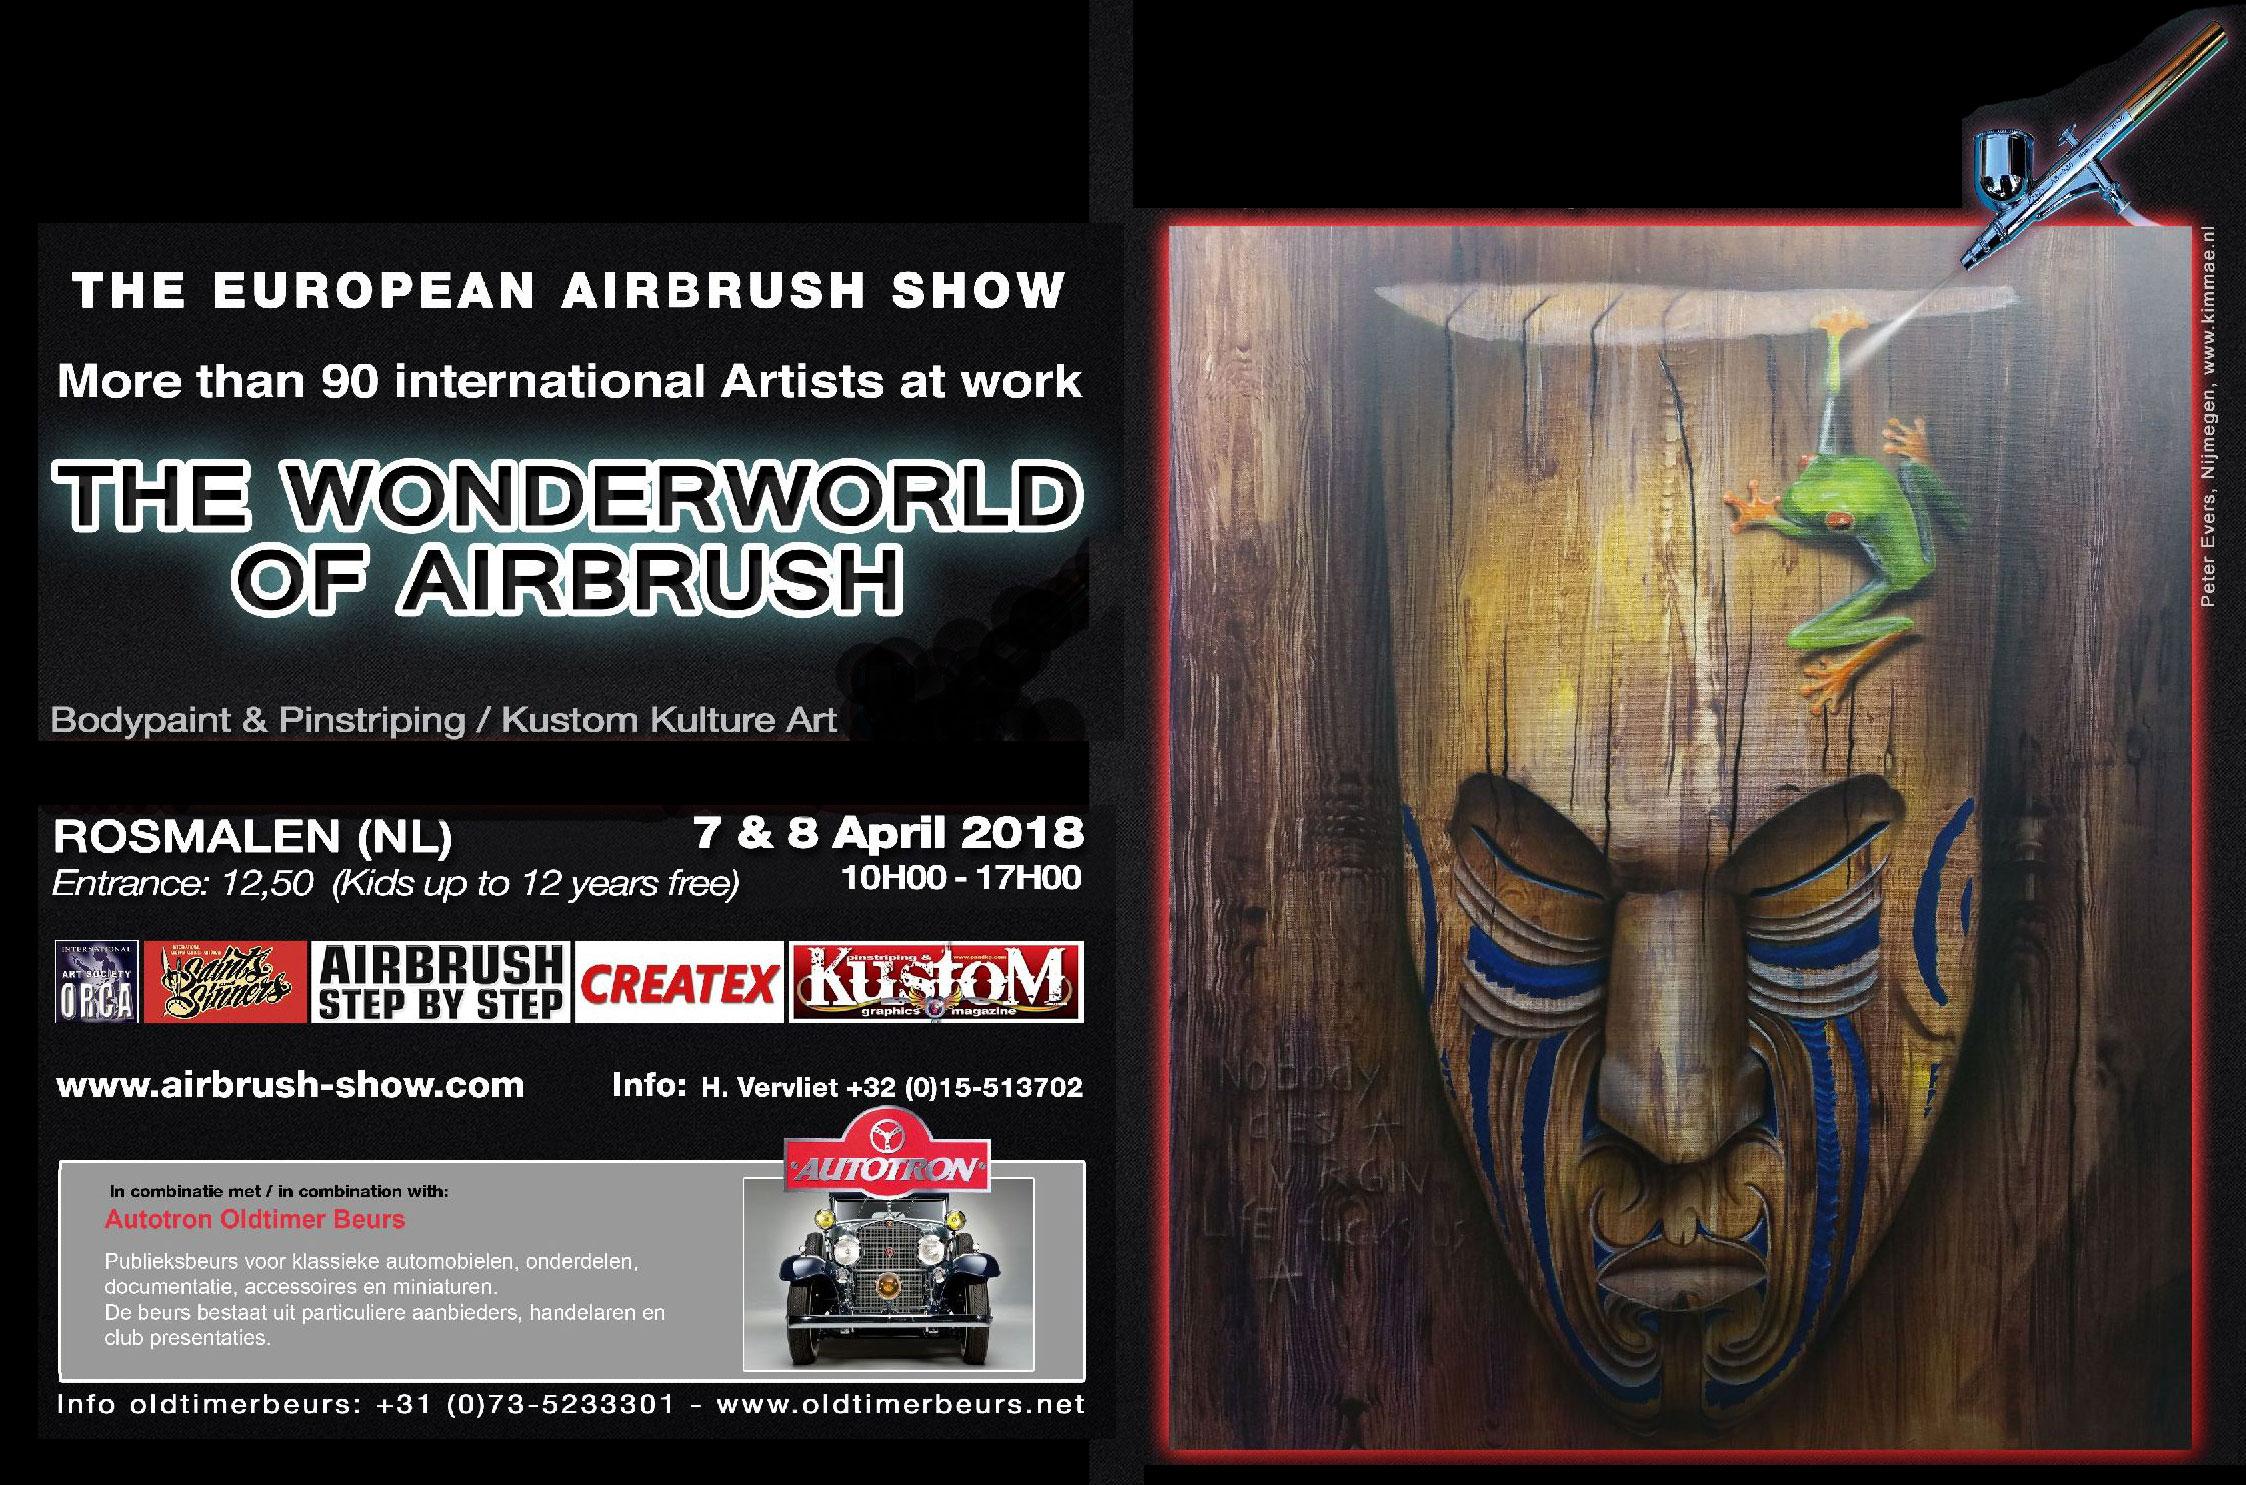 The WonderWorld of Airbrush in Rosmalen: Airbrush trifft Kustom Kulture Art